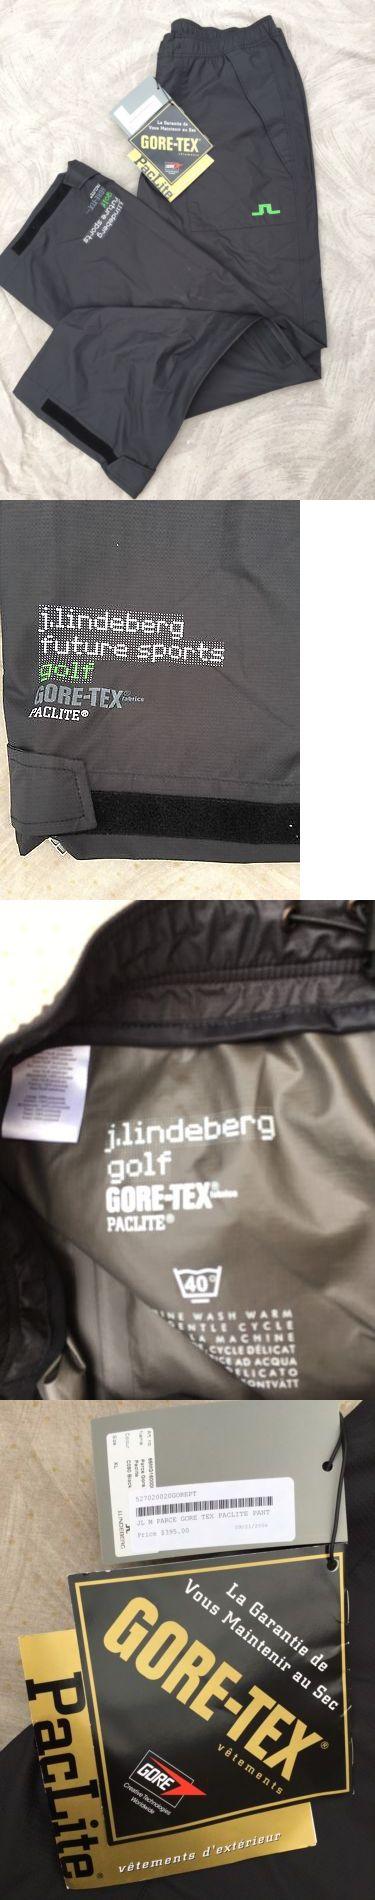 Pants 181137: J Lindeberg Gore-Tex Paclite Waterproof Breathable Golf Pants Black Xl -> BUY IT NOW ONLY: $198 on eBay!